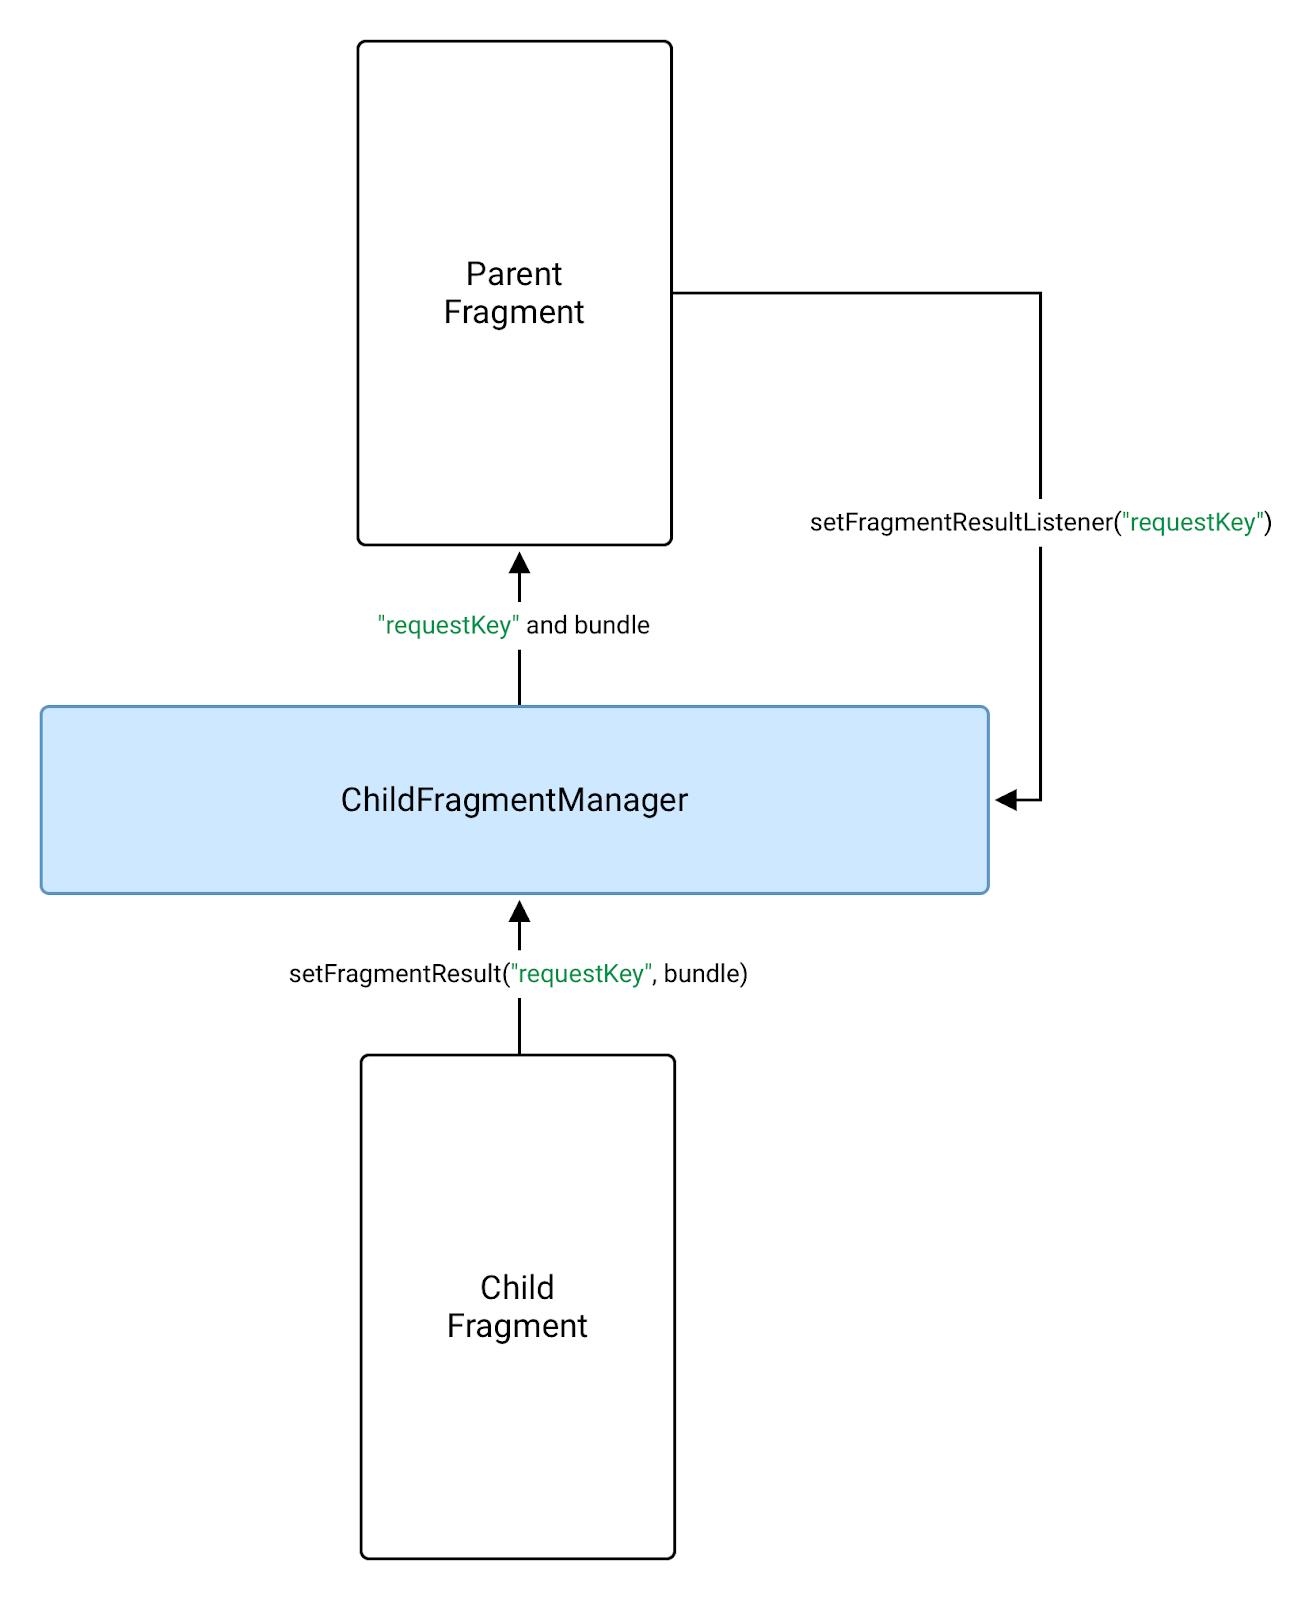 FragmentManager を使用して子フラグメントが親に結果を送信する